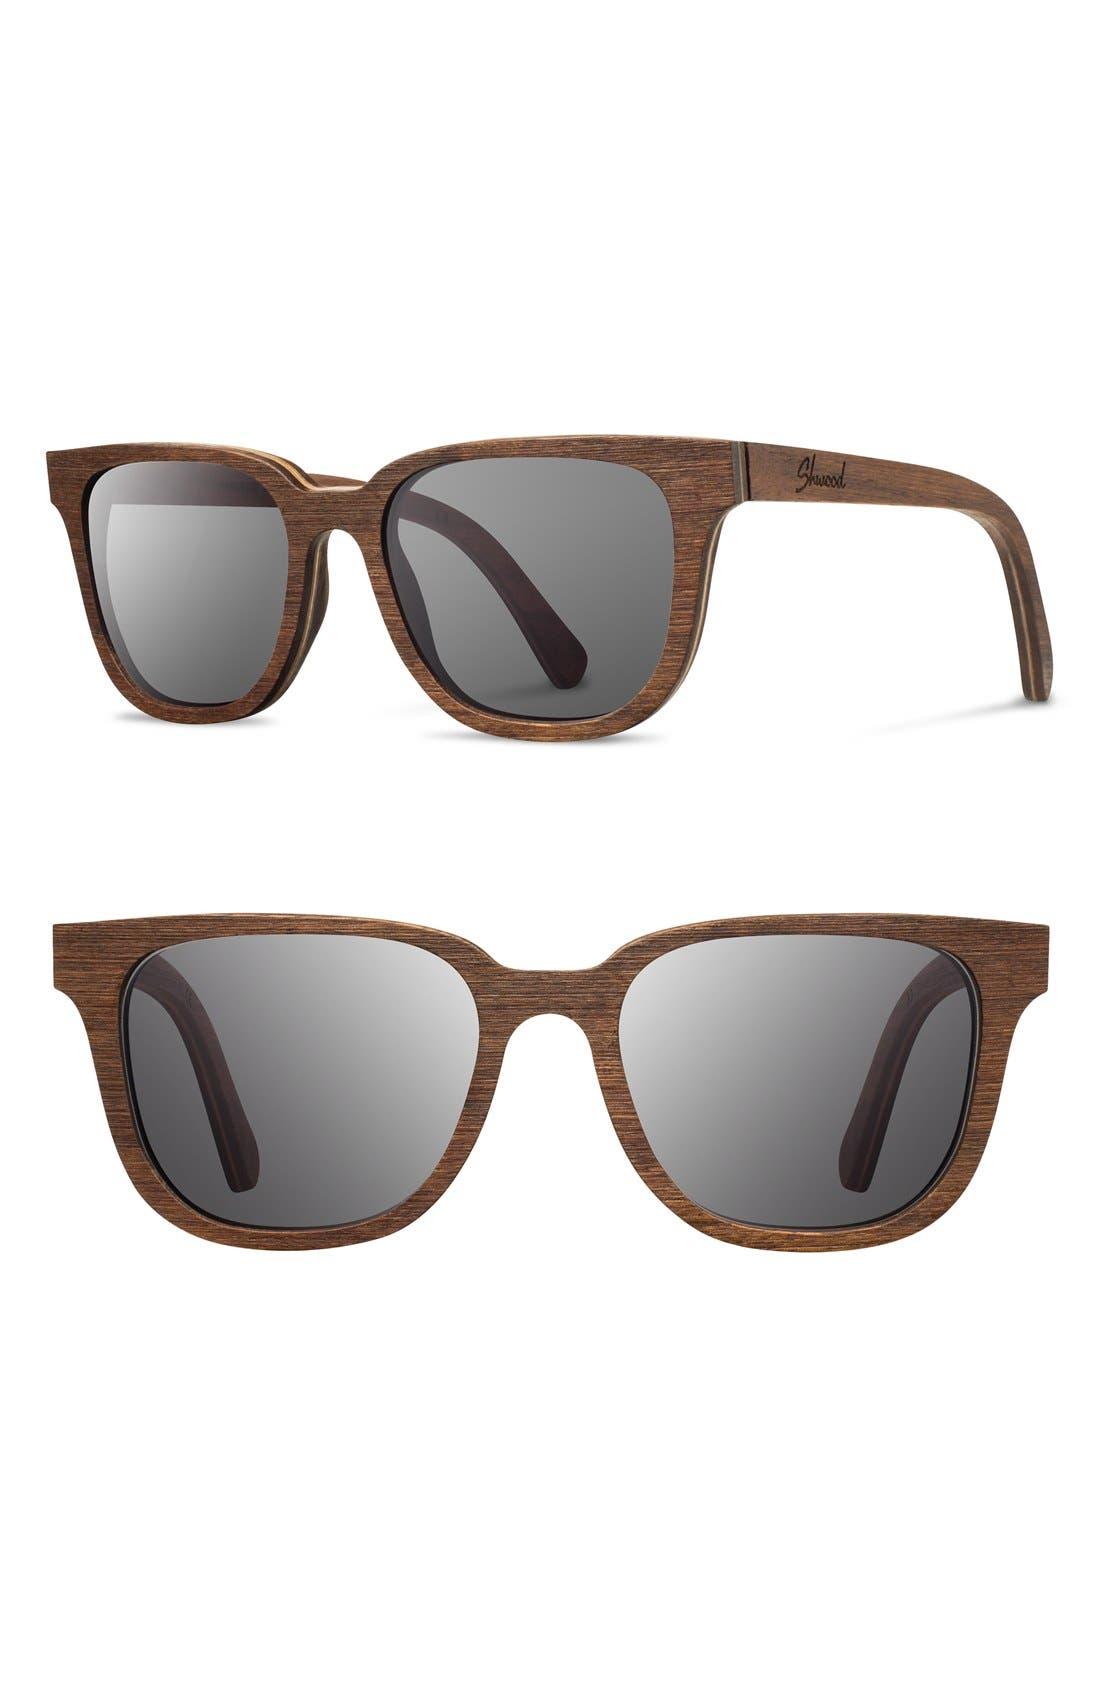 'Prescott' 53mm Wood Sunglasses,                             Main thumbnail 1, color,                             WALNUT/ GREY